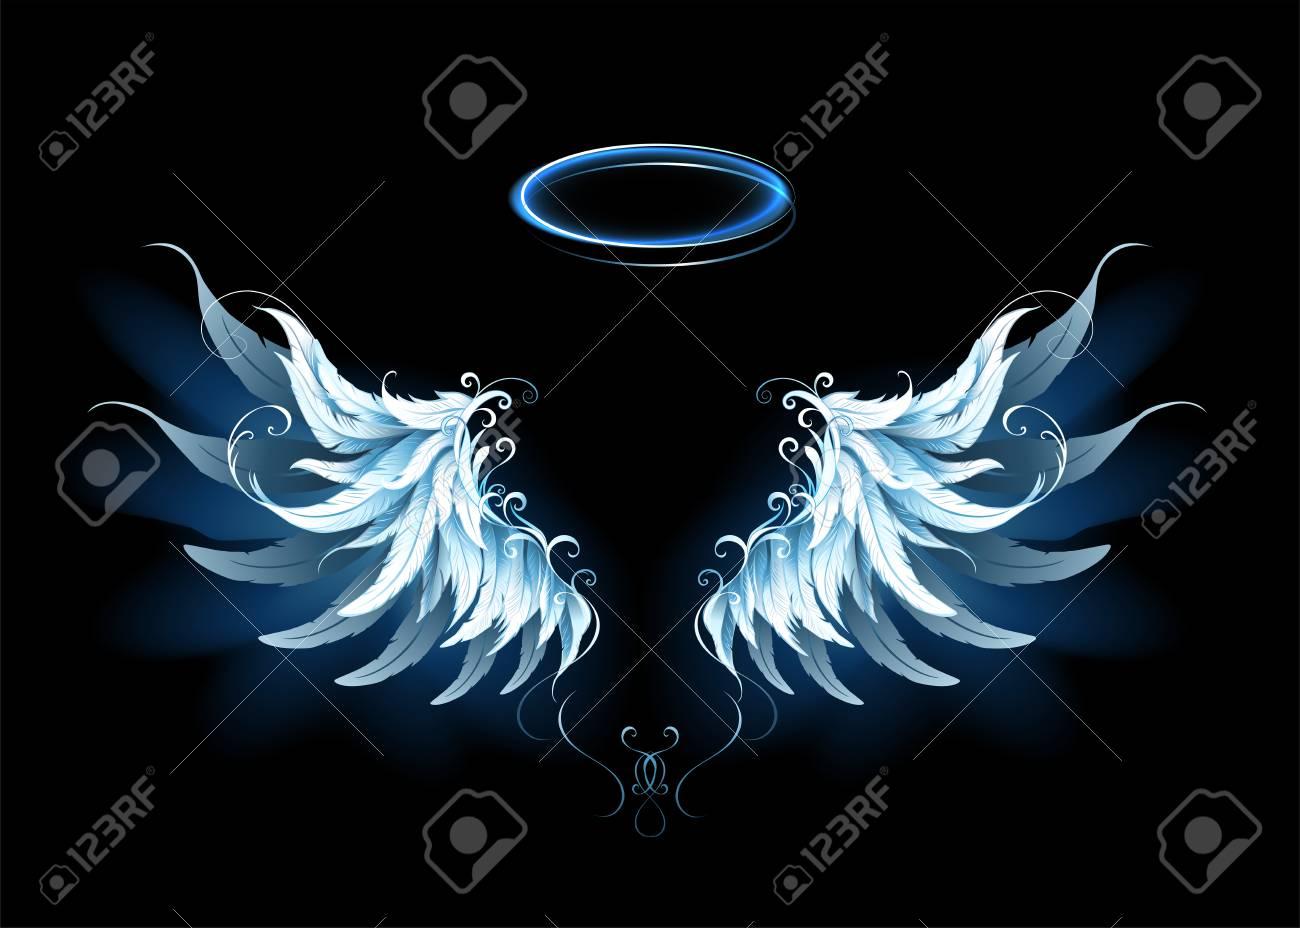 Light artistic blue angel wings. - 89098653